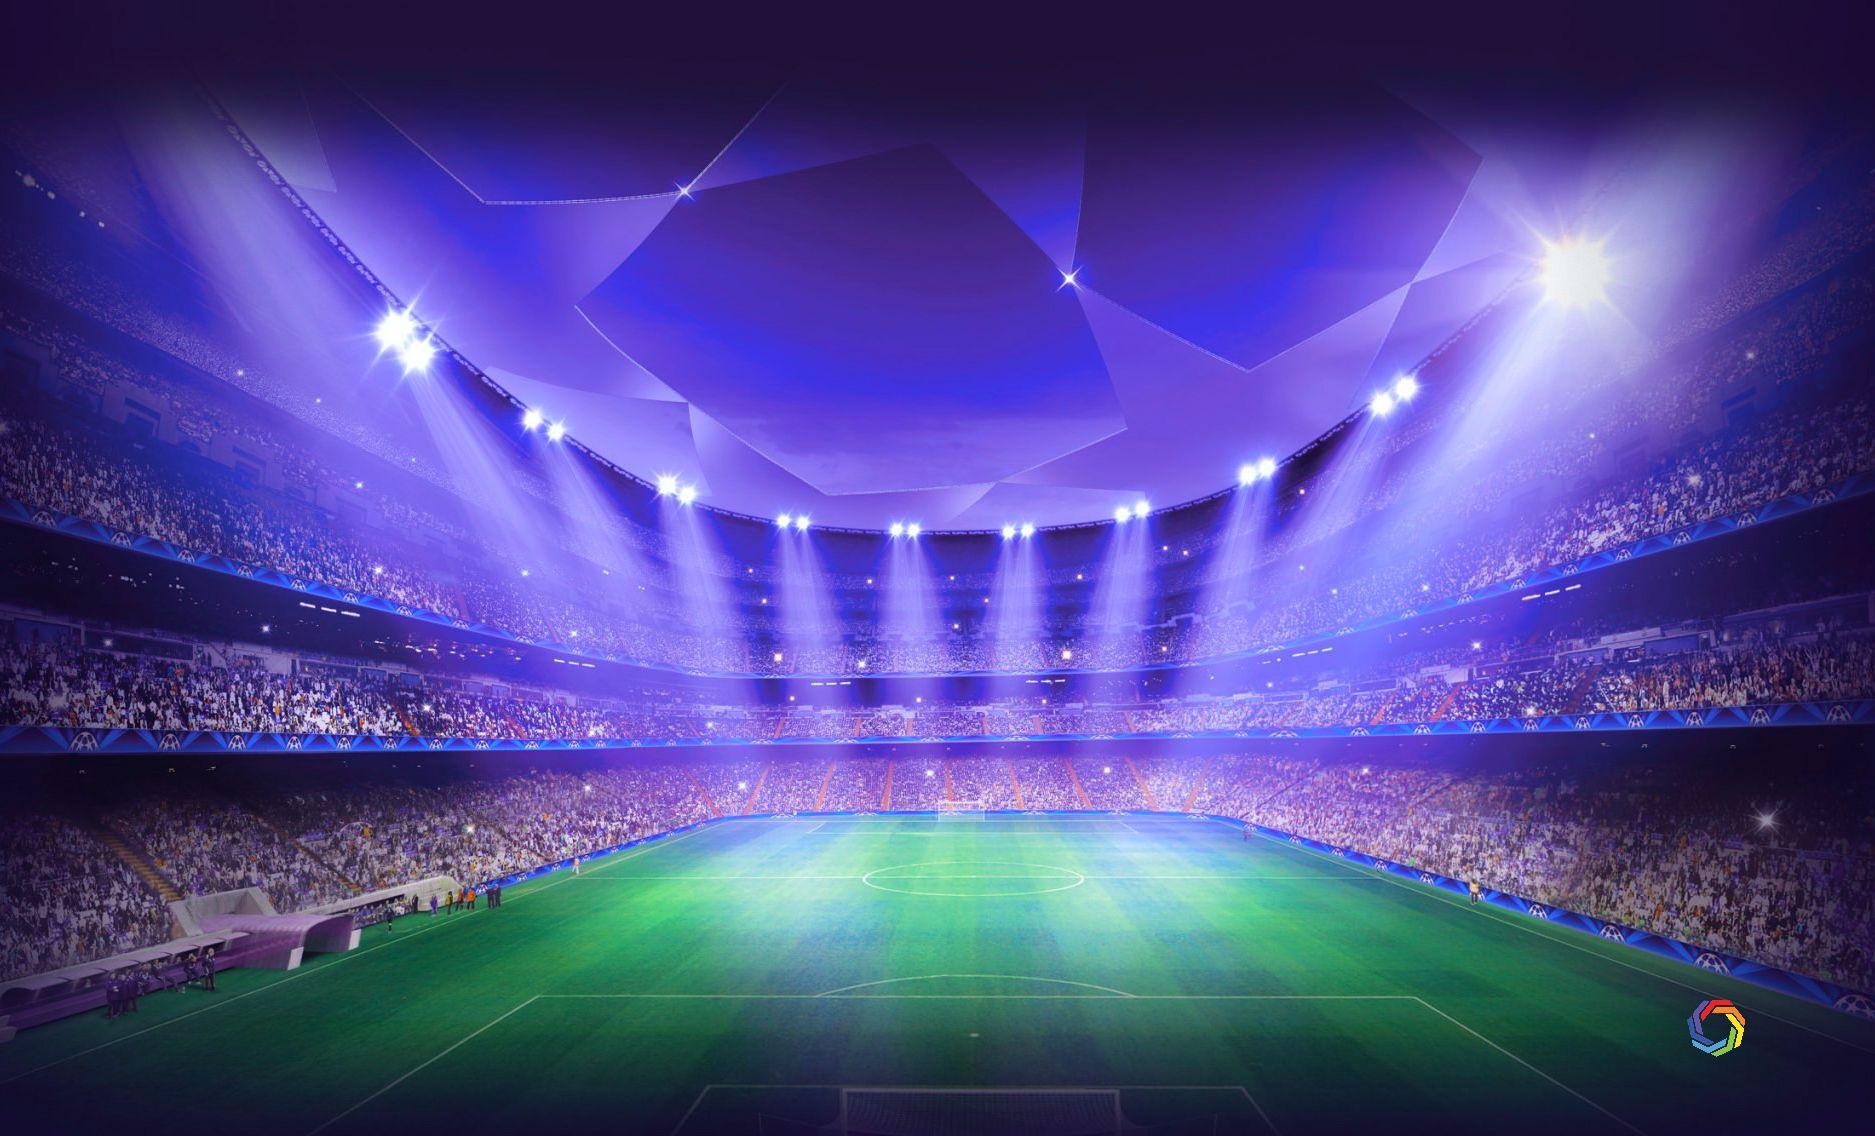 Download Free Sports Ultra Hd Wallpaper Free Hd Widescreen Wallpaper Or High Definition Widescreen Wallpapers Sports Wallpapers Free Sport Neymar Jr Wallpapers